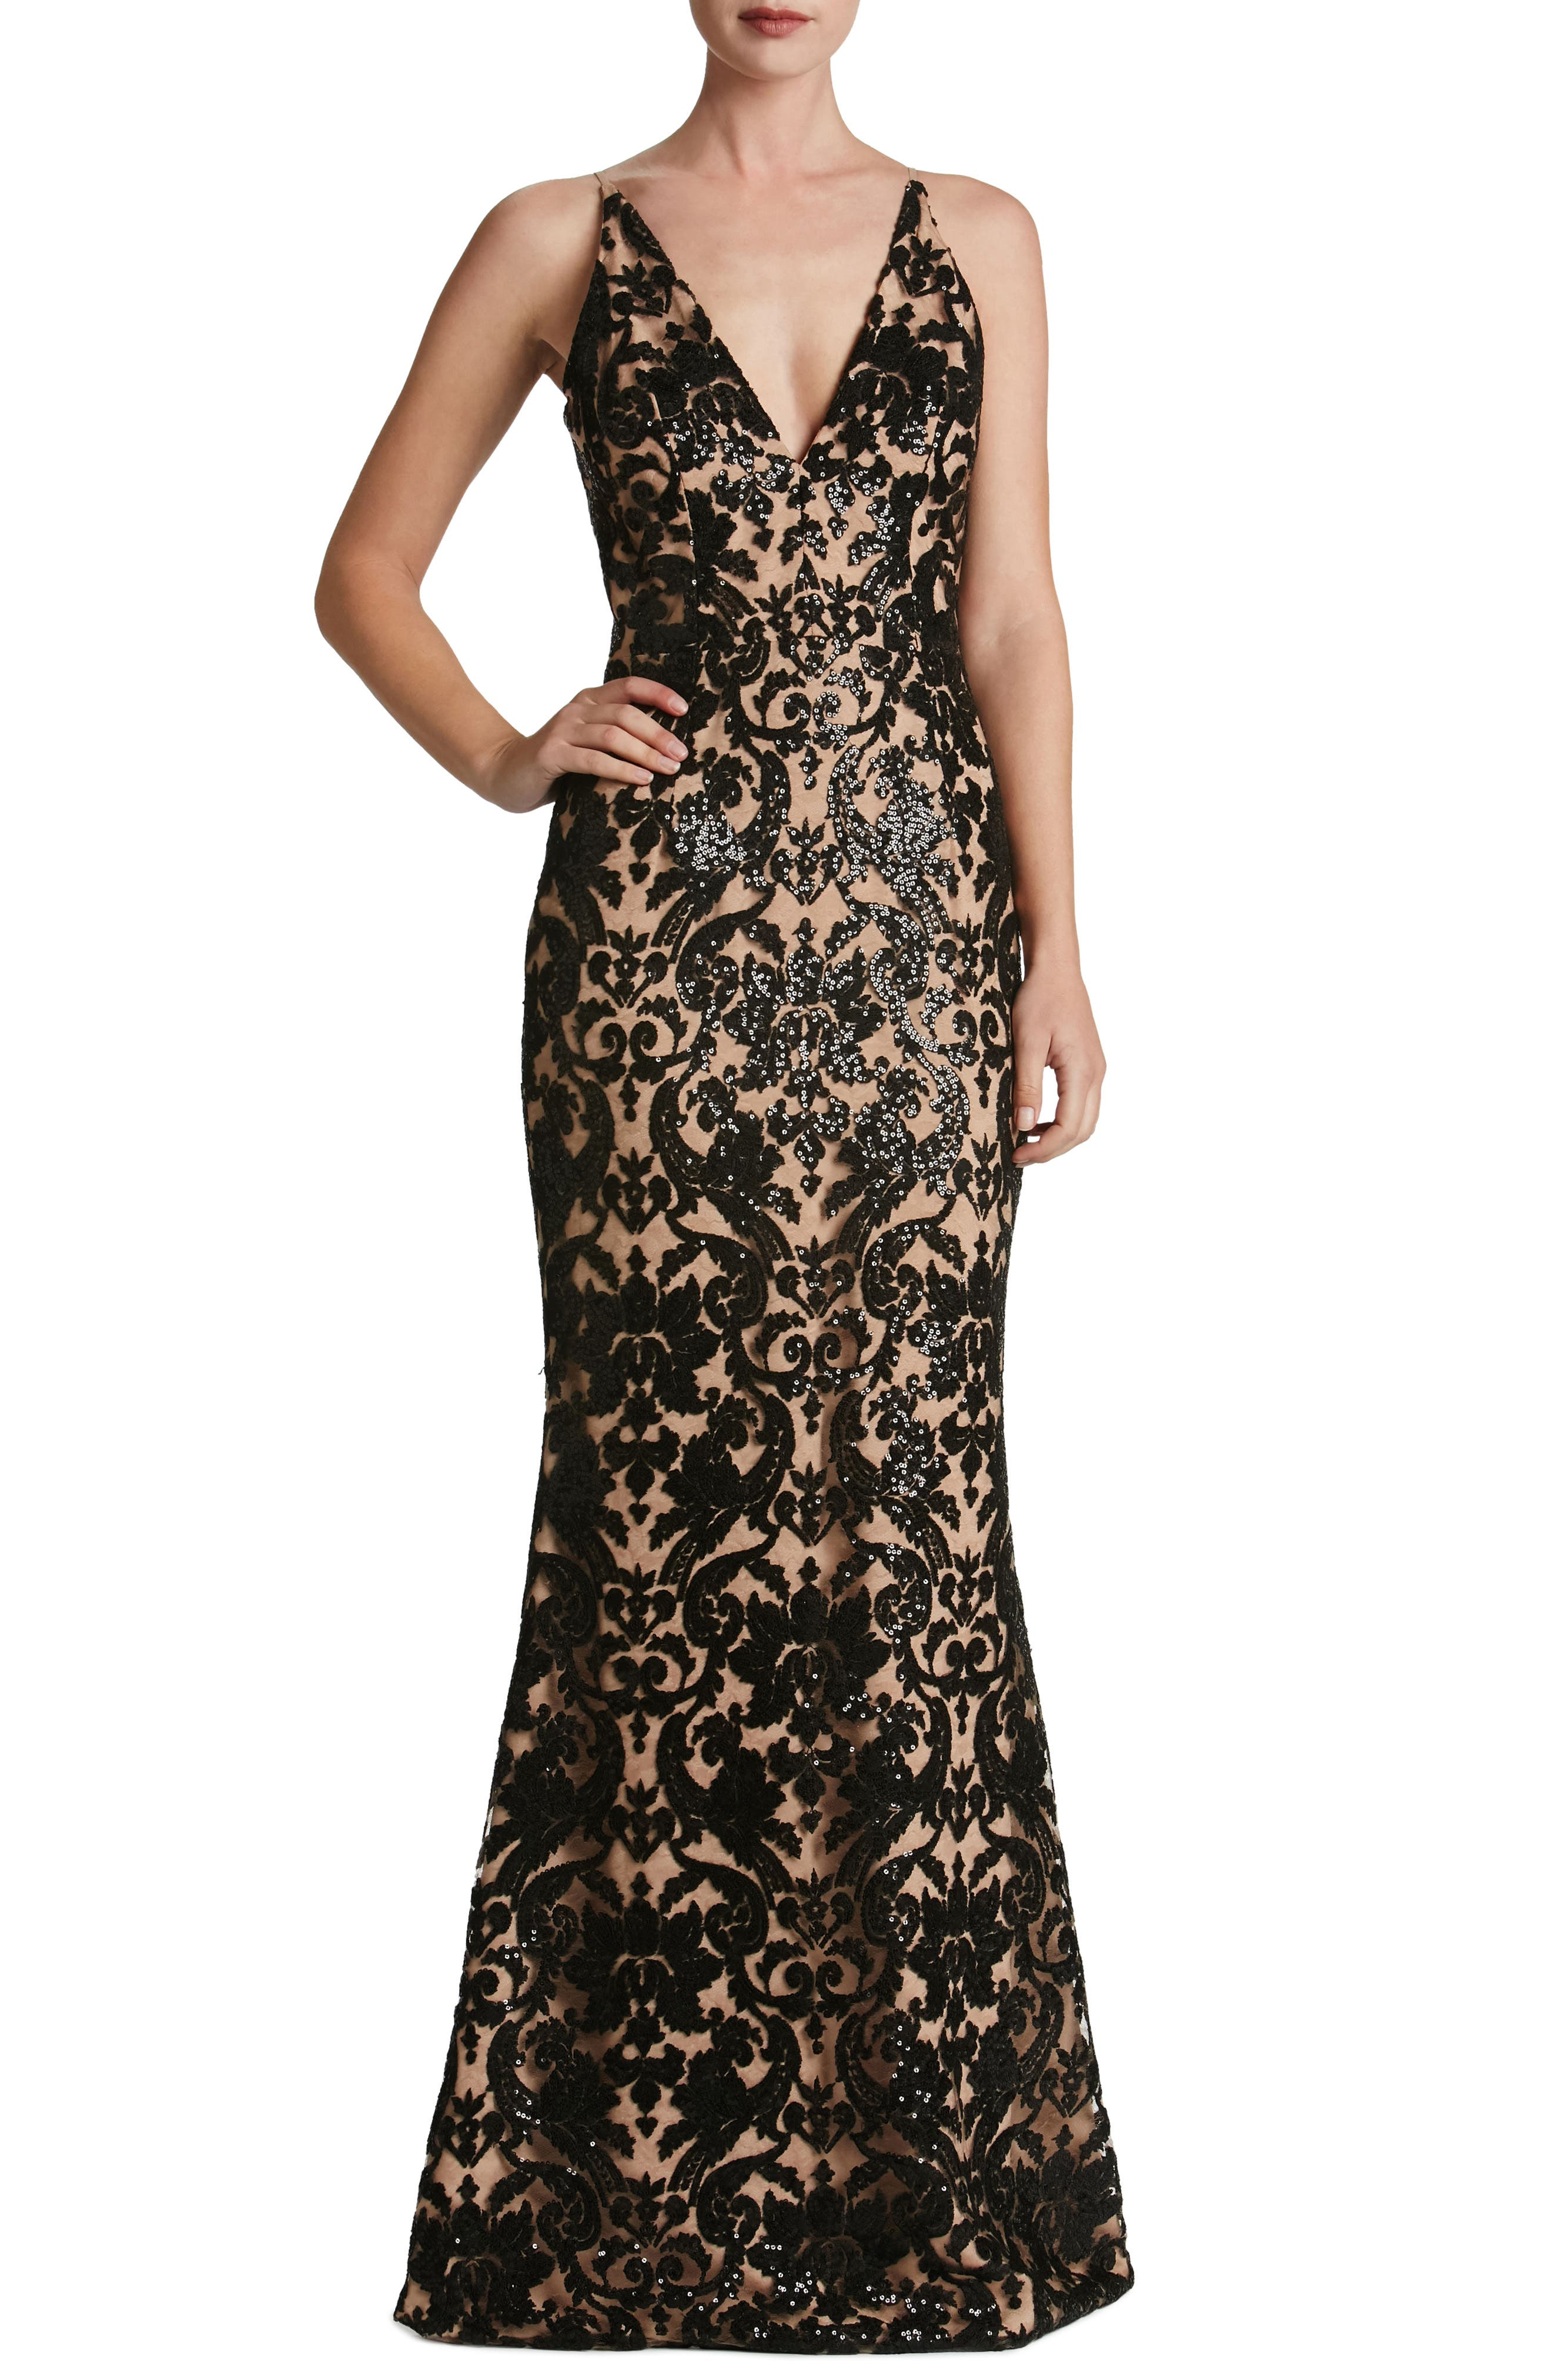 Karen Mermaid Gown,                         Main,                         color, Black/ Nude Lace